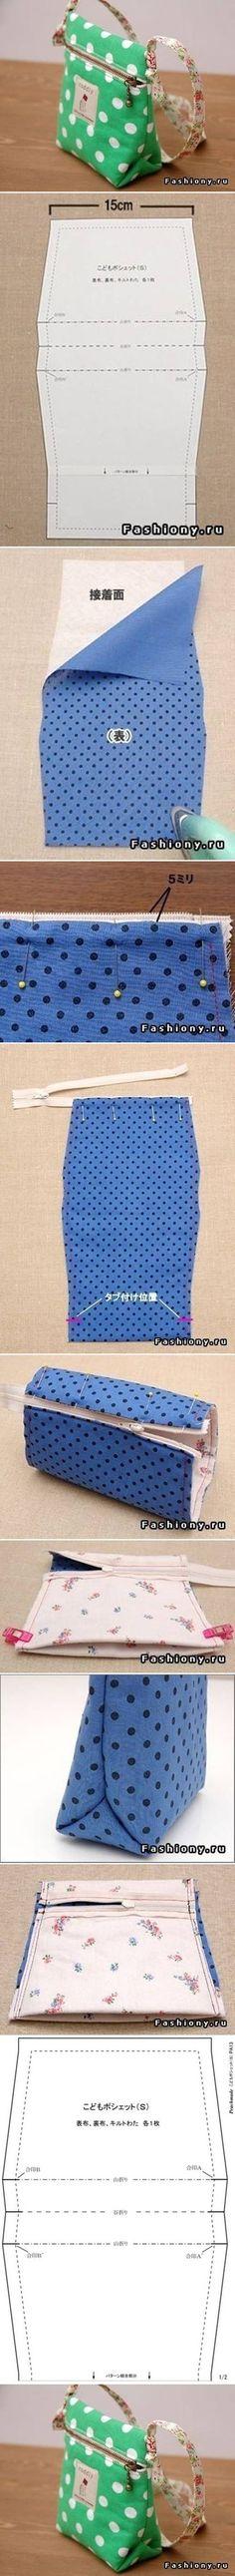 DIY Small Sew Handbag DIY Projects / UsefulDIY.com